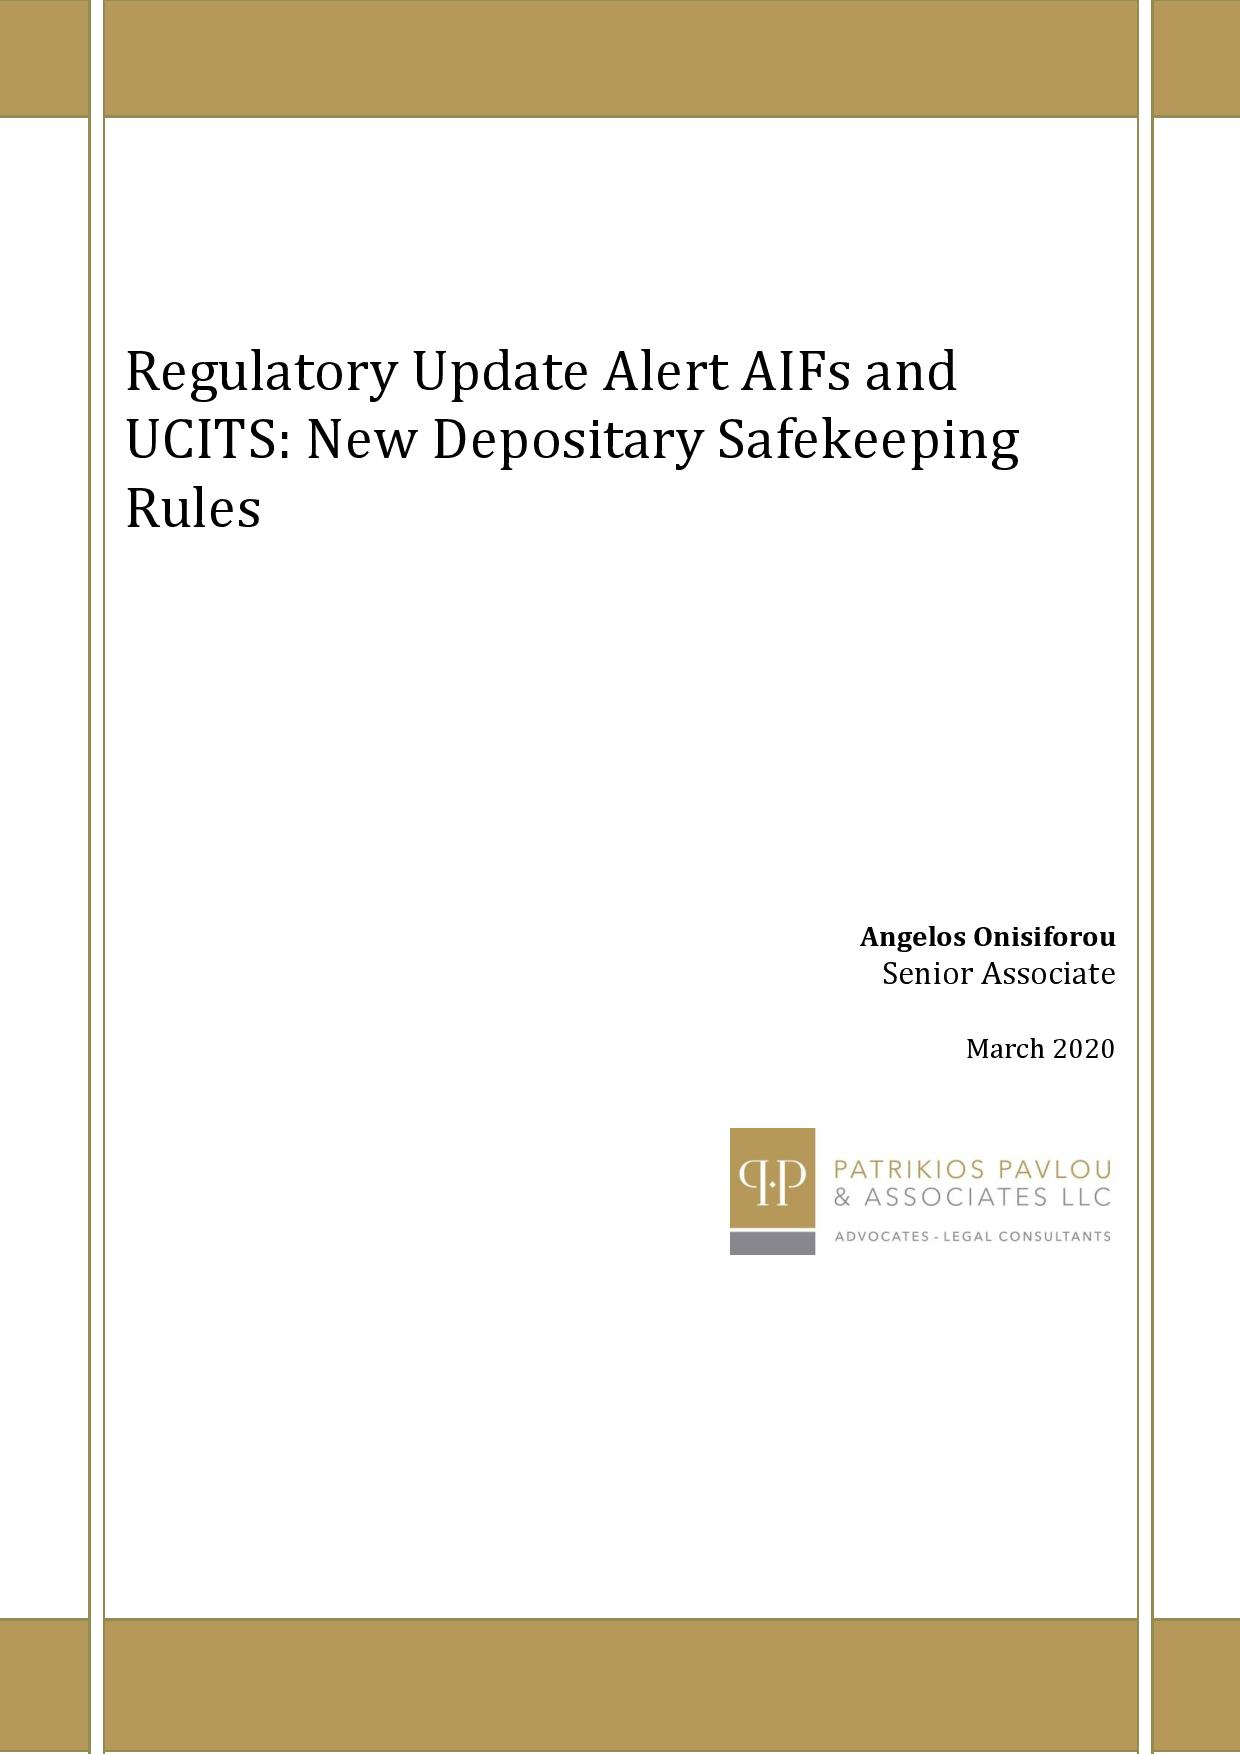 Patrikios Pavlou & Associates LLC: Regulatory Update Alert AIFs and UCITS: New Depositary Safekeeping Rules